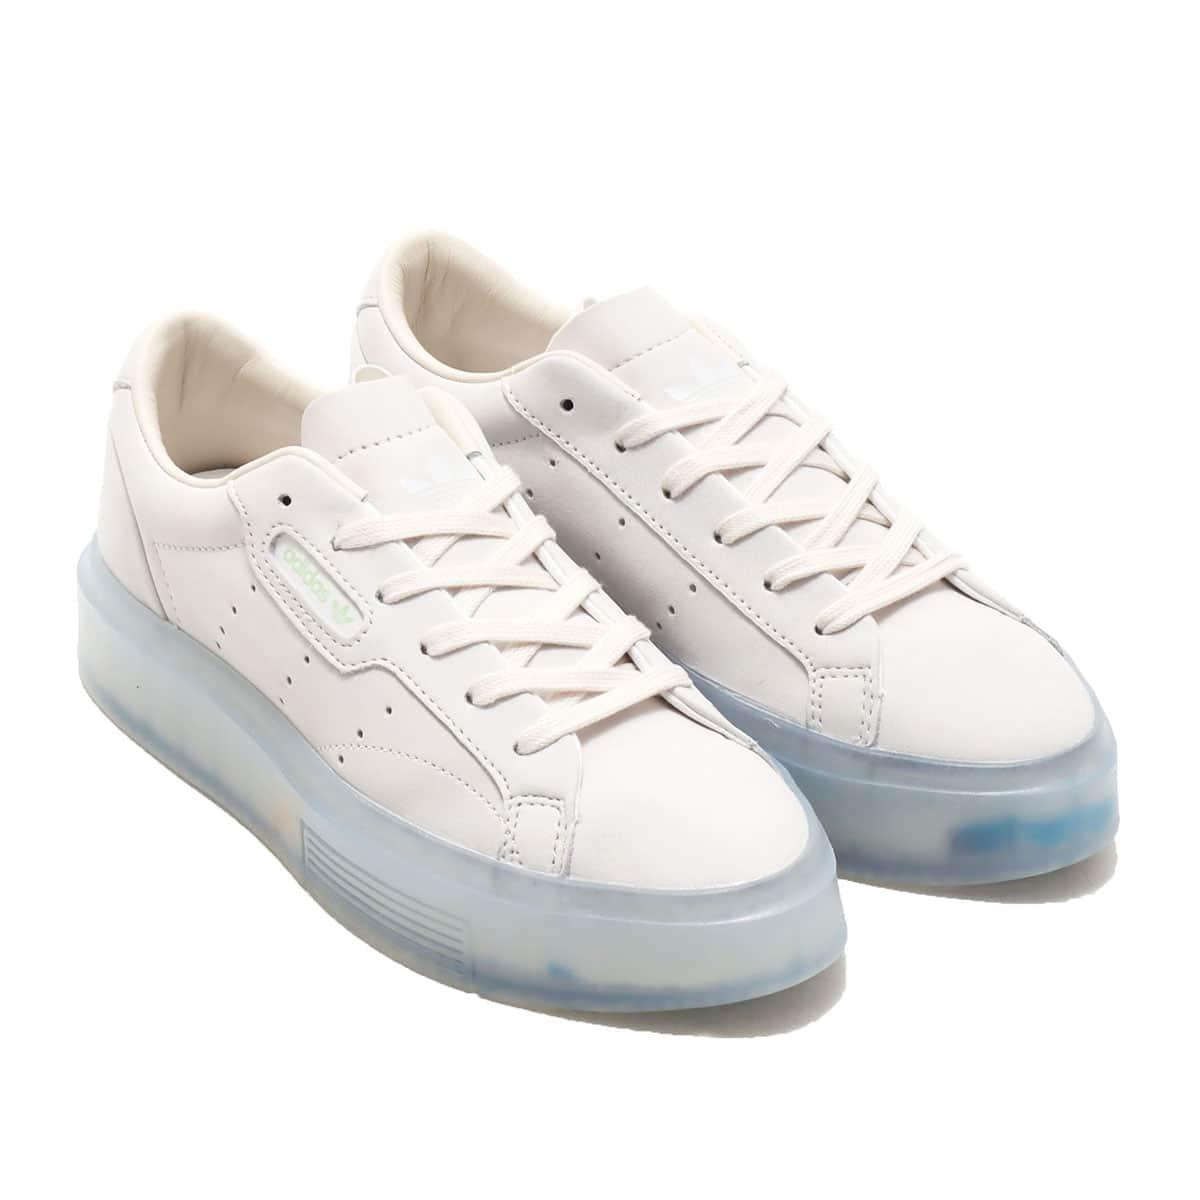 ANGEL CHEN x adidas SLEEK SUPER W AC CLOUD WHITE/FTWR WHITE/CHALK WHITE 20SS-S_photo_large